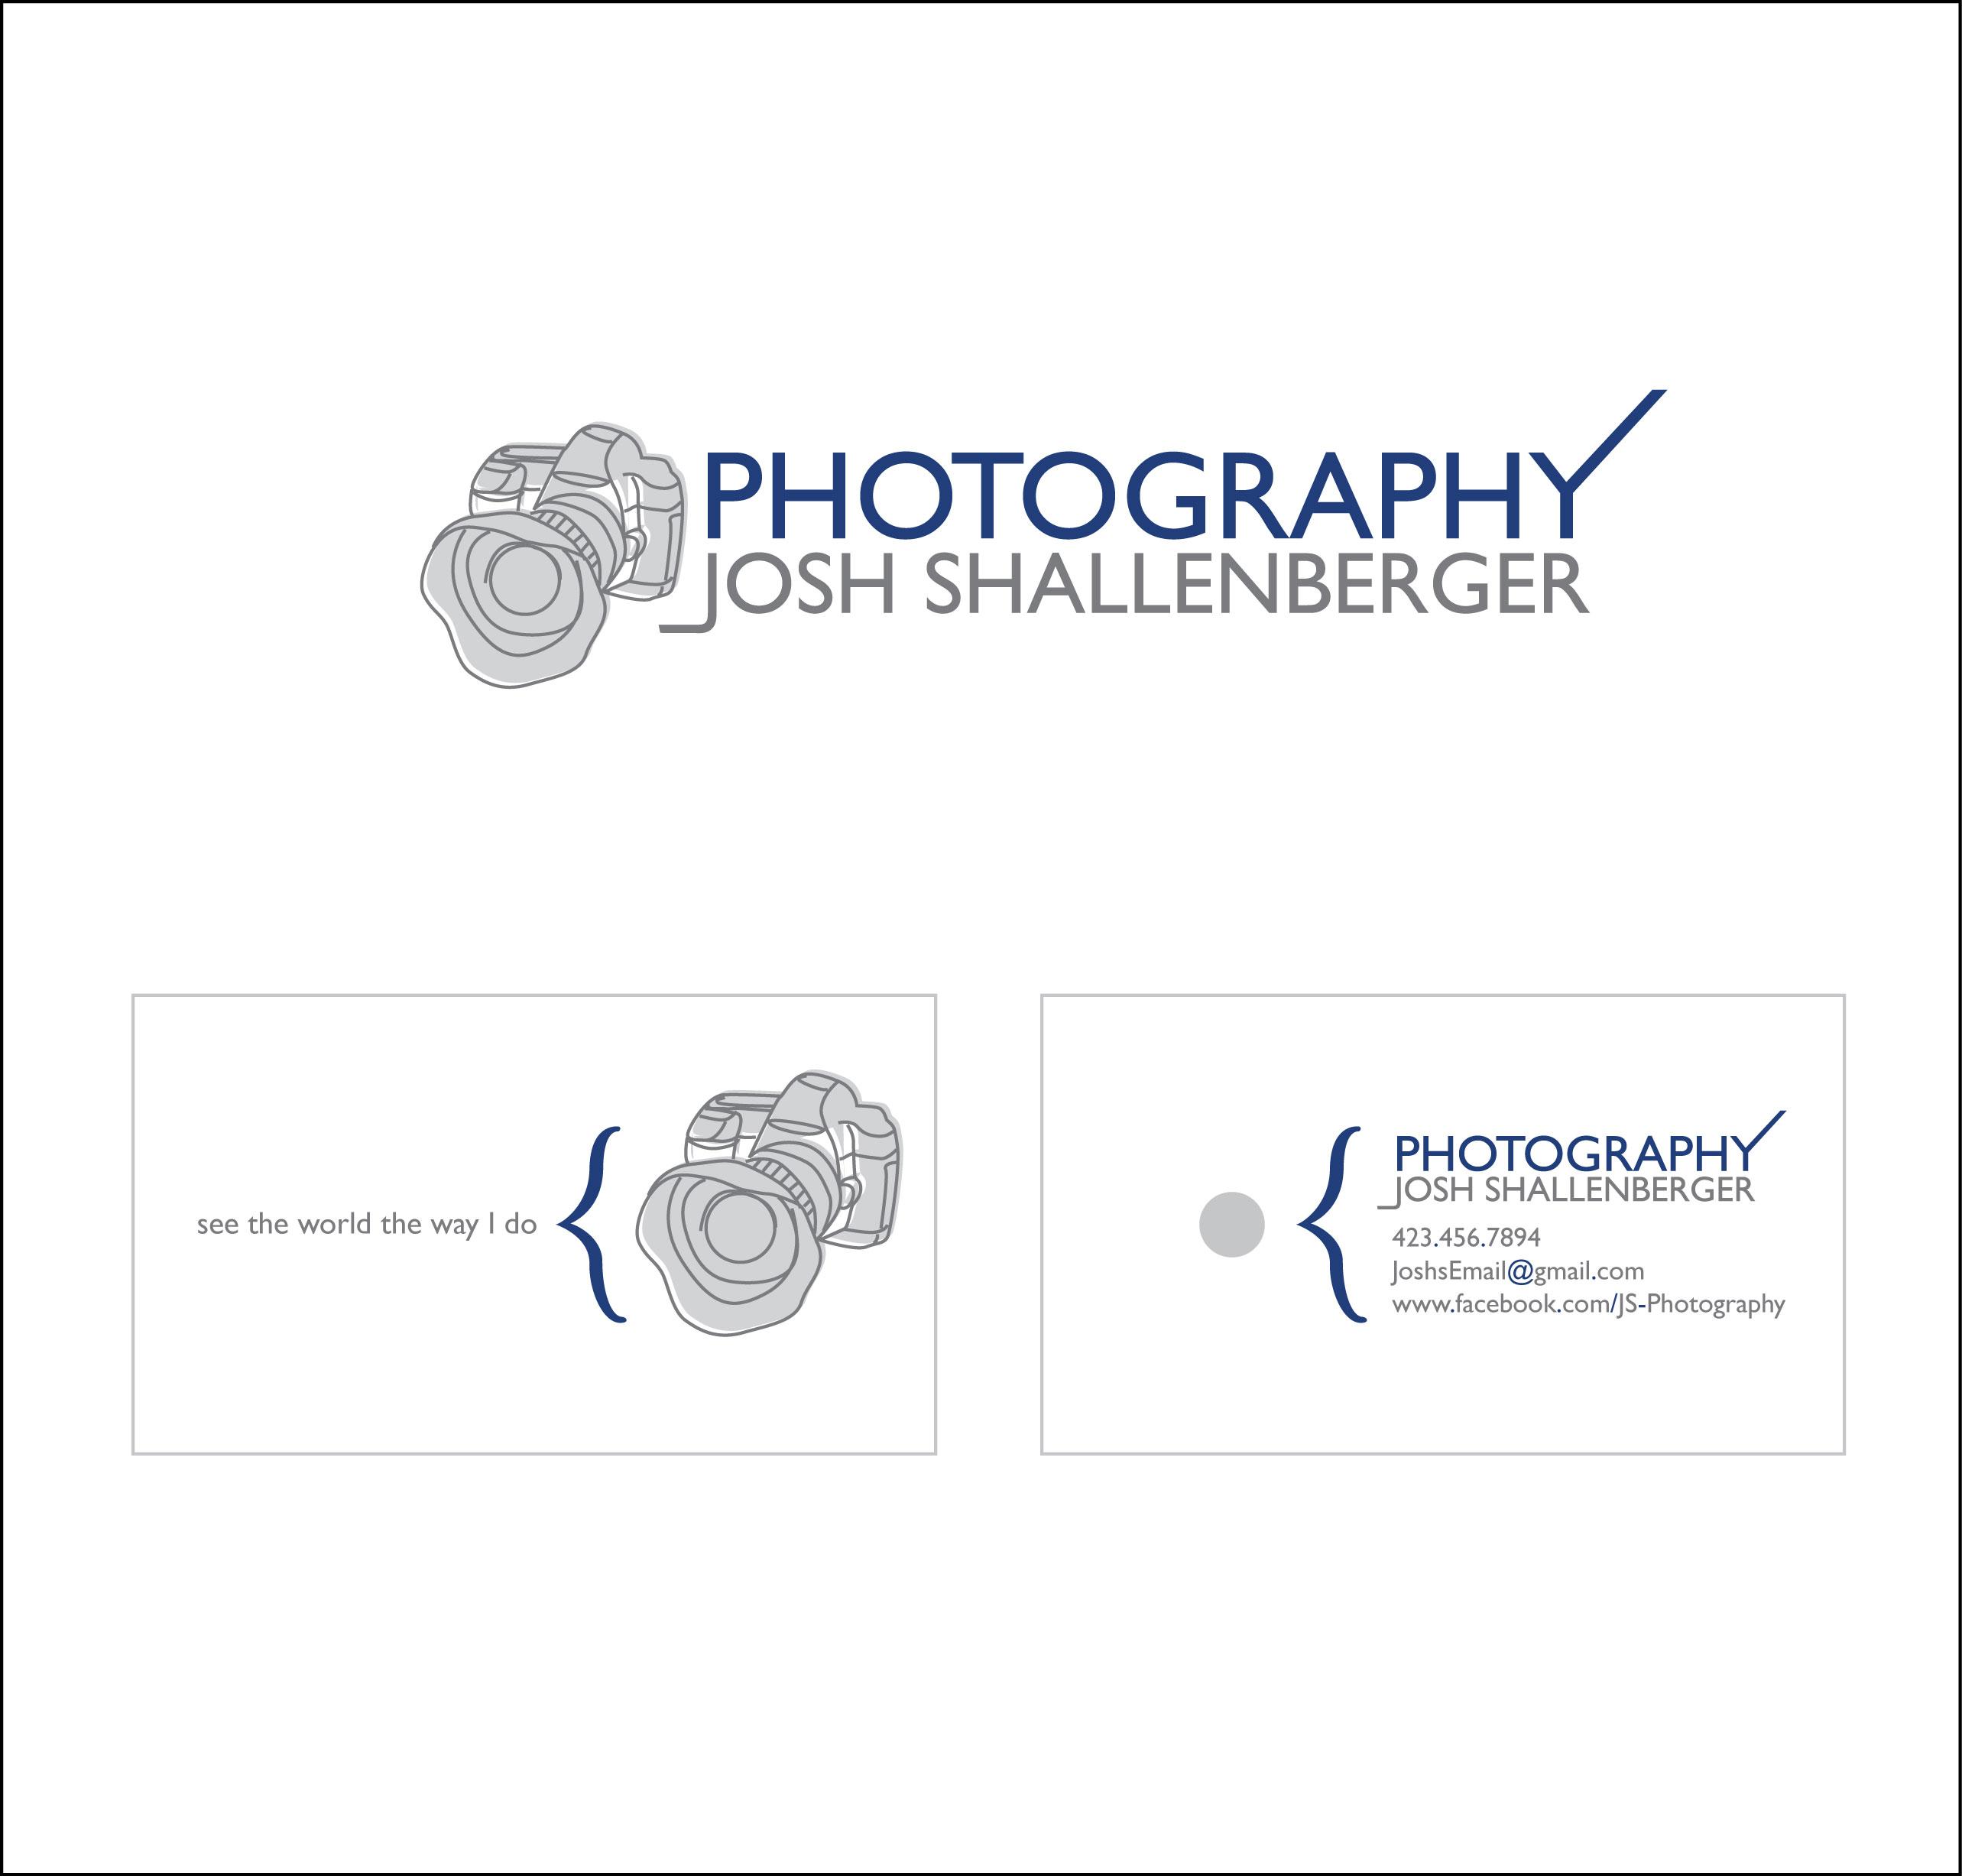 12 Photography Logo Ideas Images